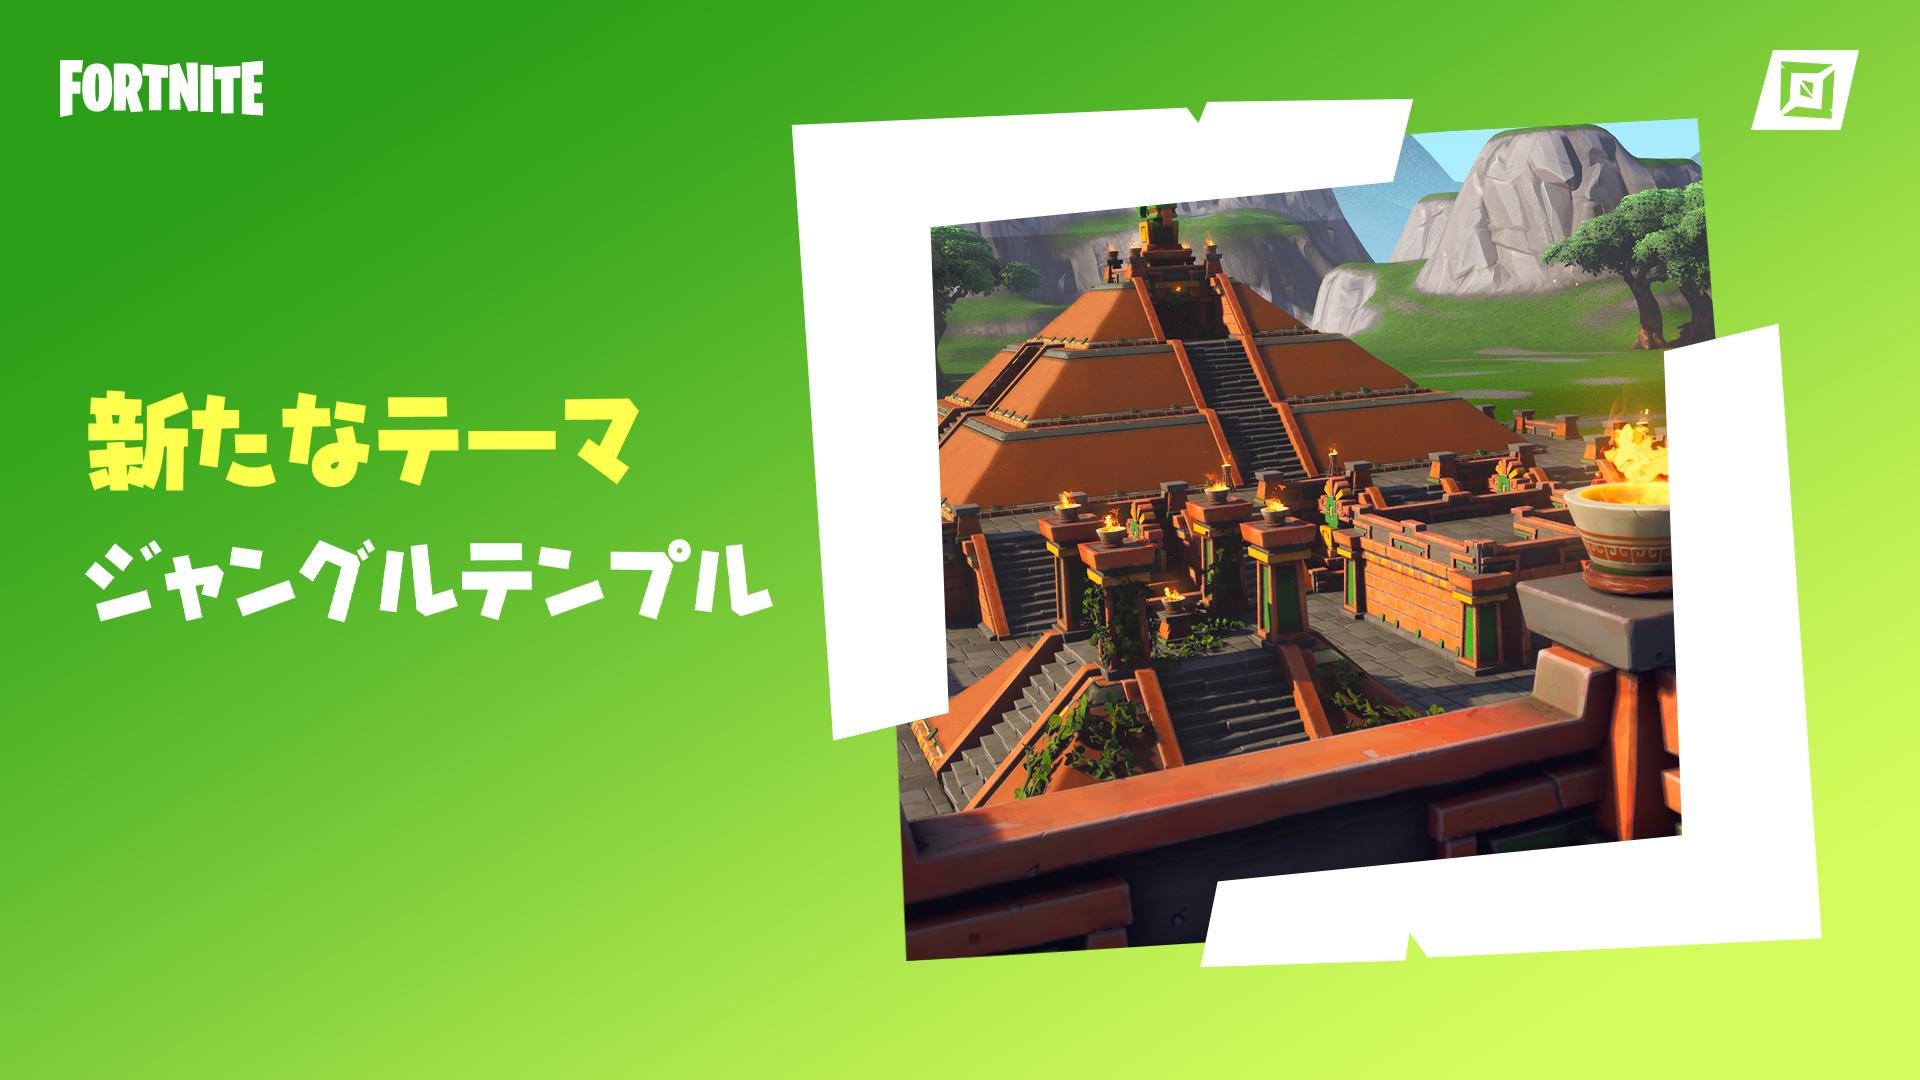 JP_08CM_Theme_JungleTemple_Social.jpg